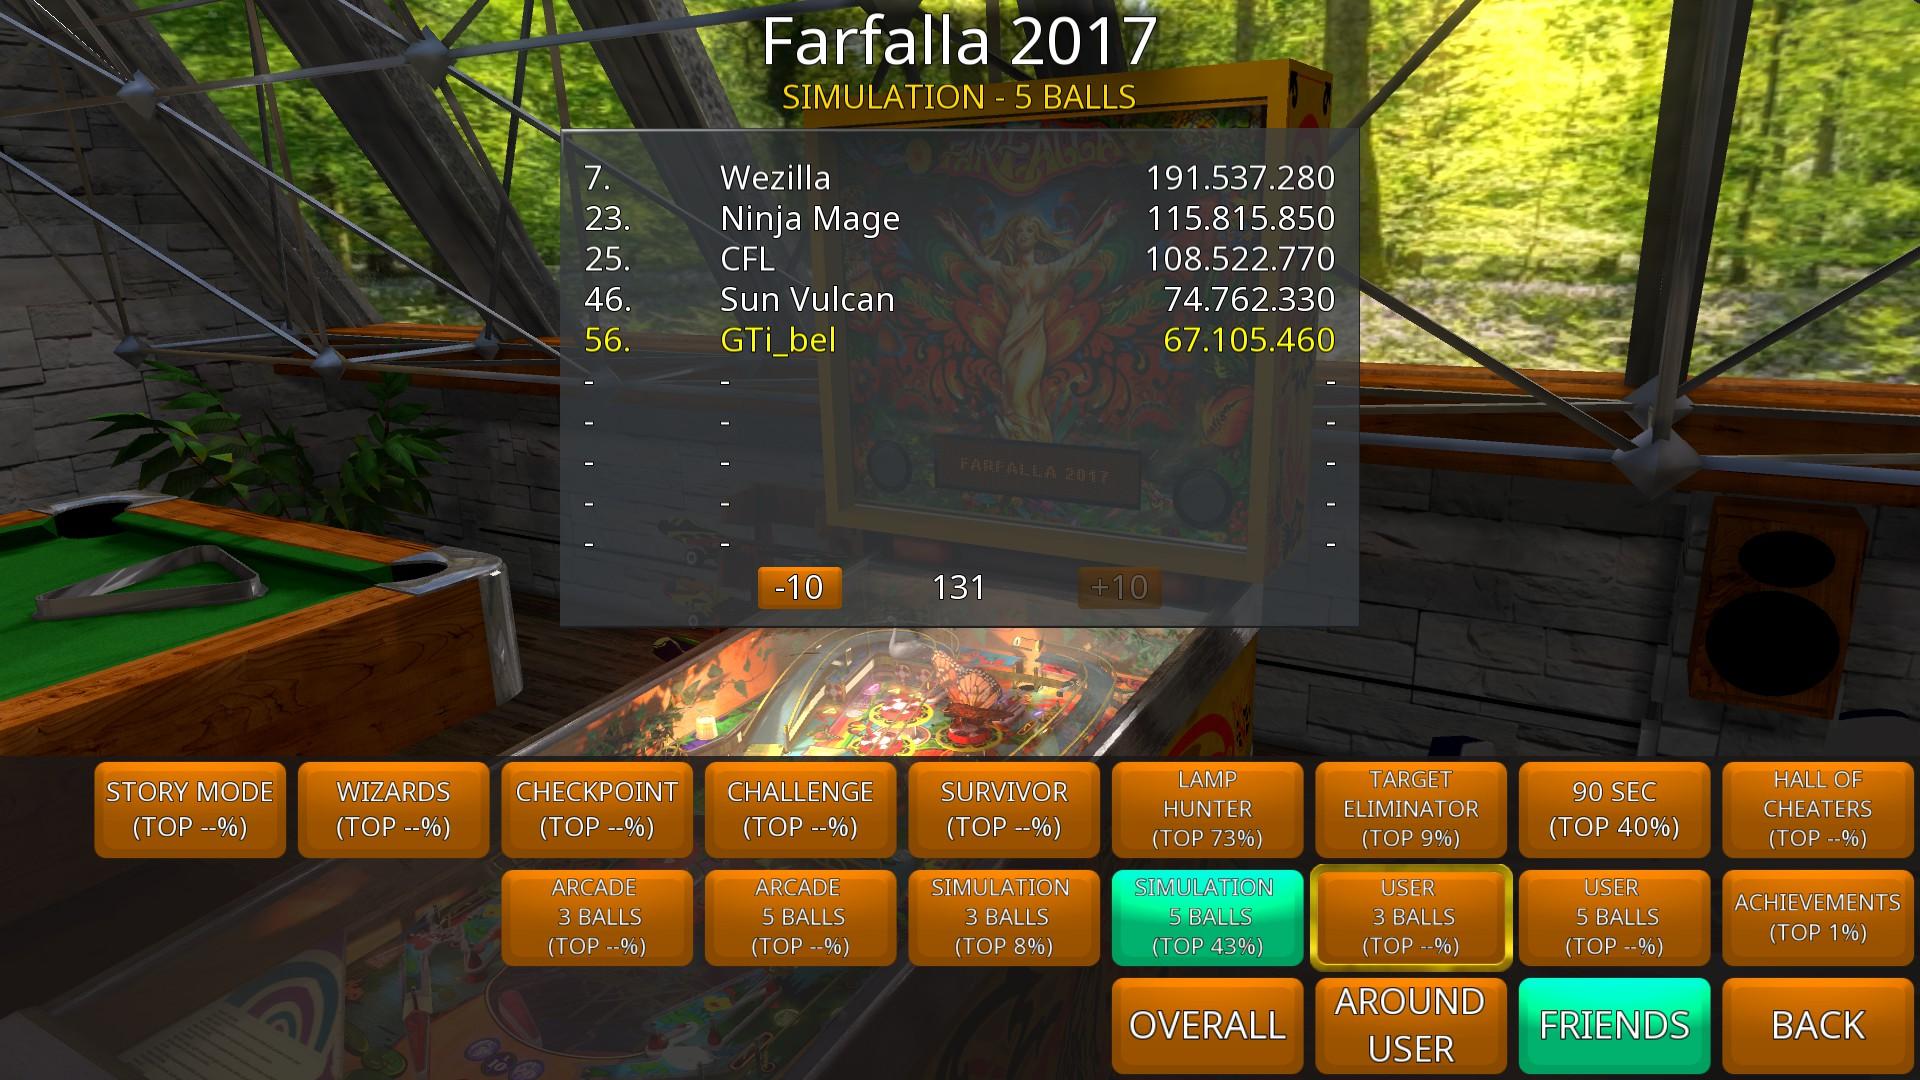 GTibel: Zaccaria Pinball: Farfalla 2017 Table [5 balls] (PC) 67,105,460 points on 2018-08-27 08:59:48